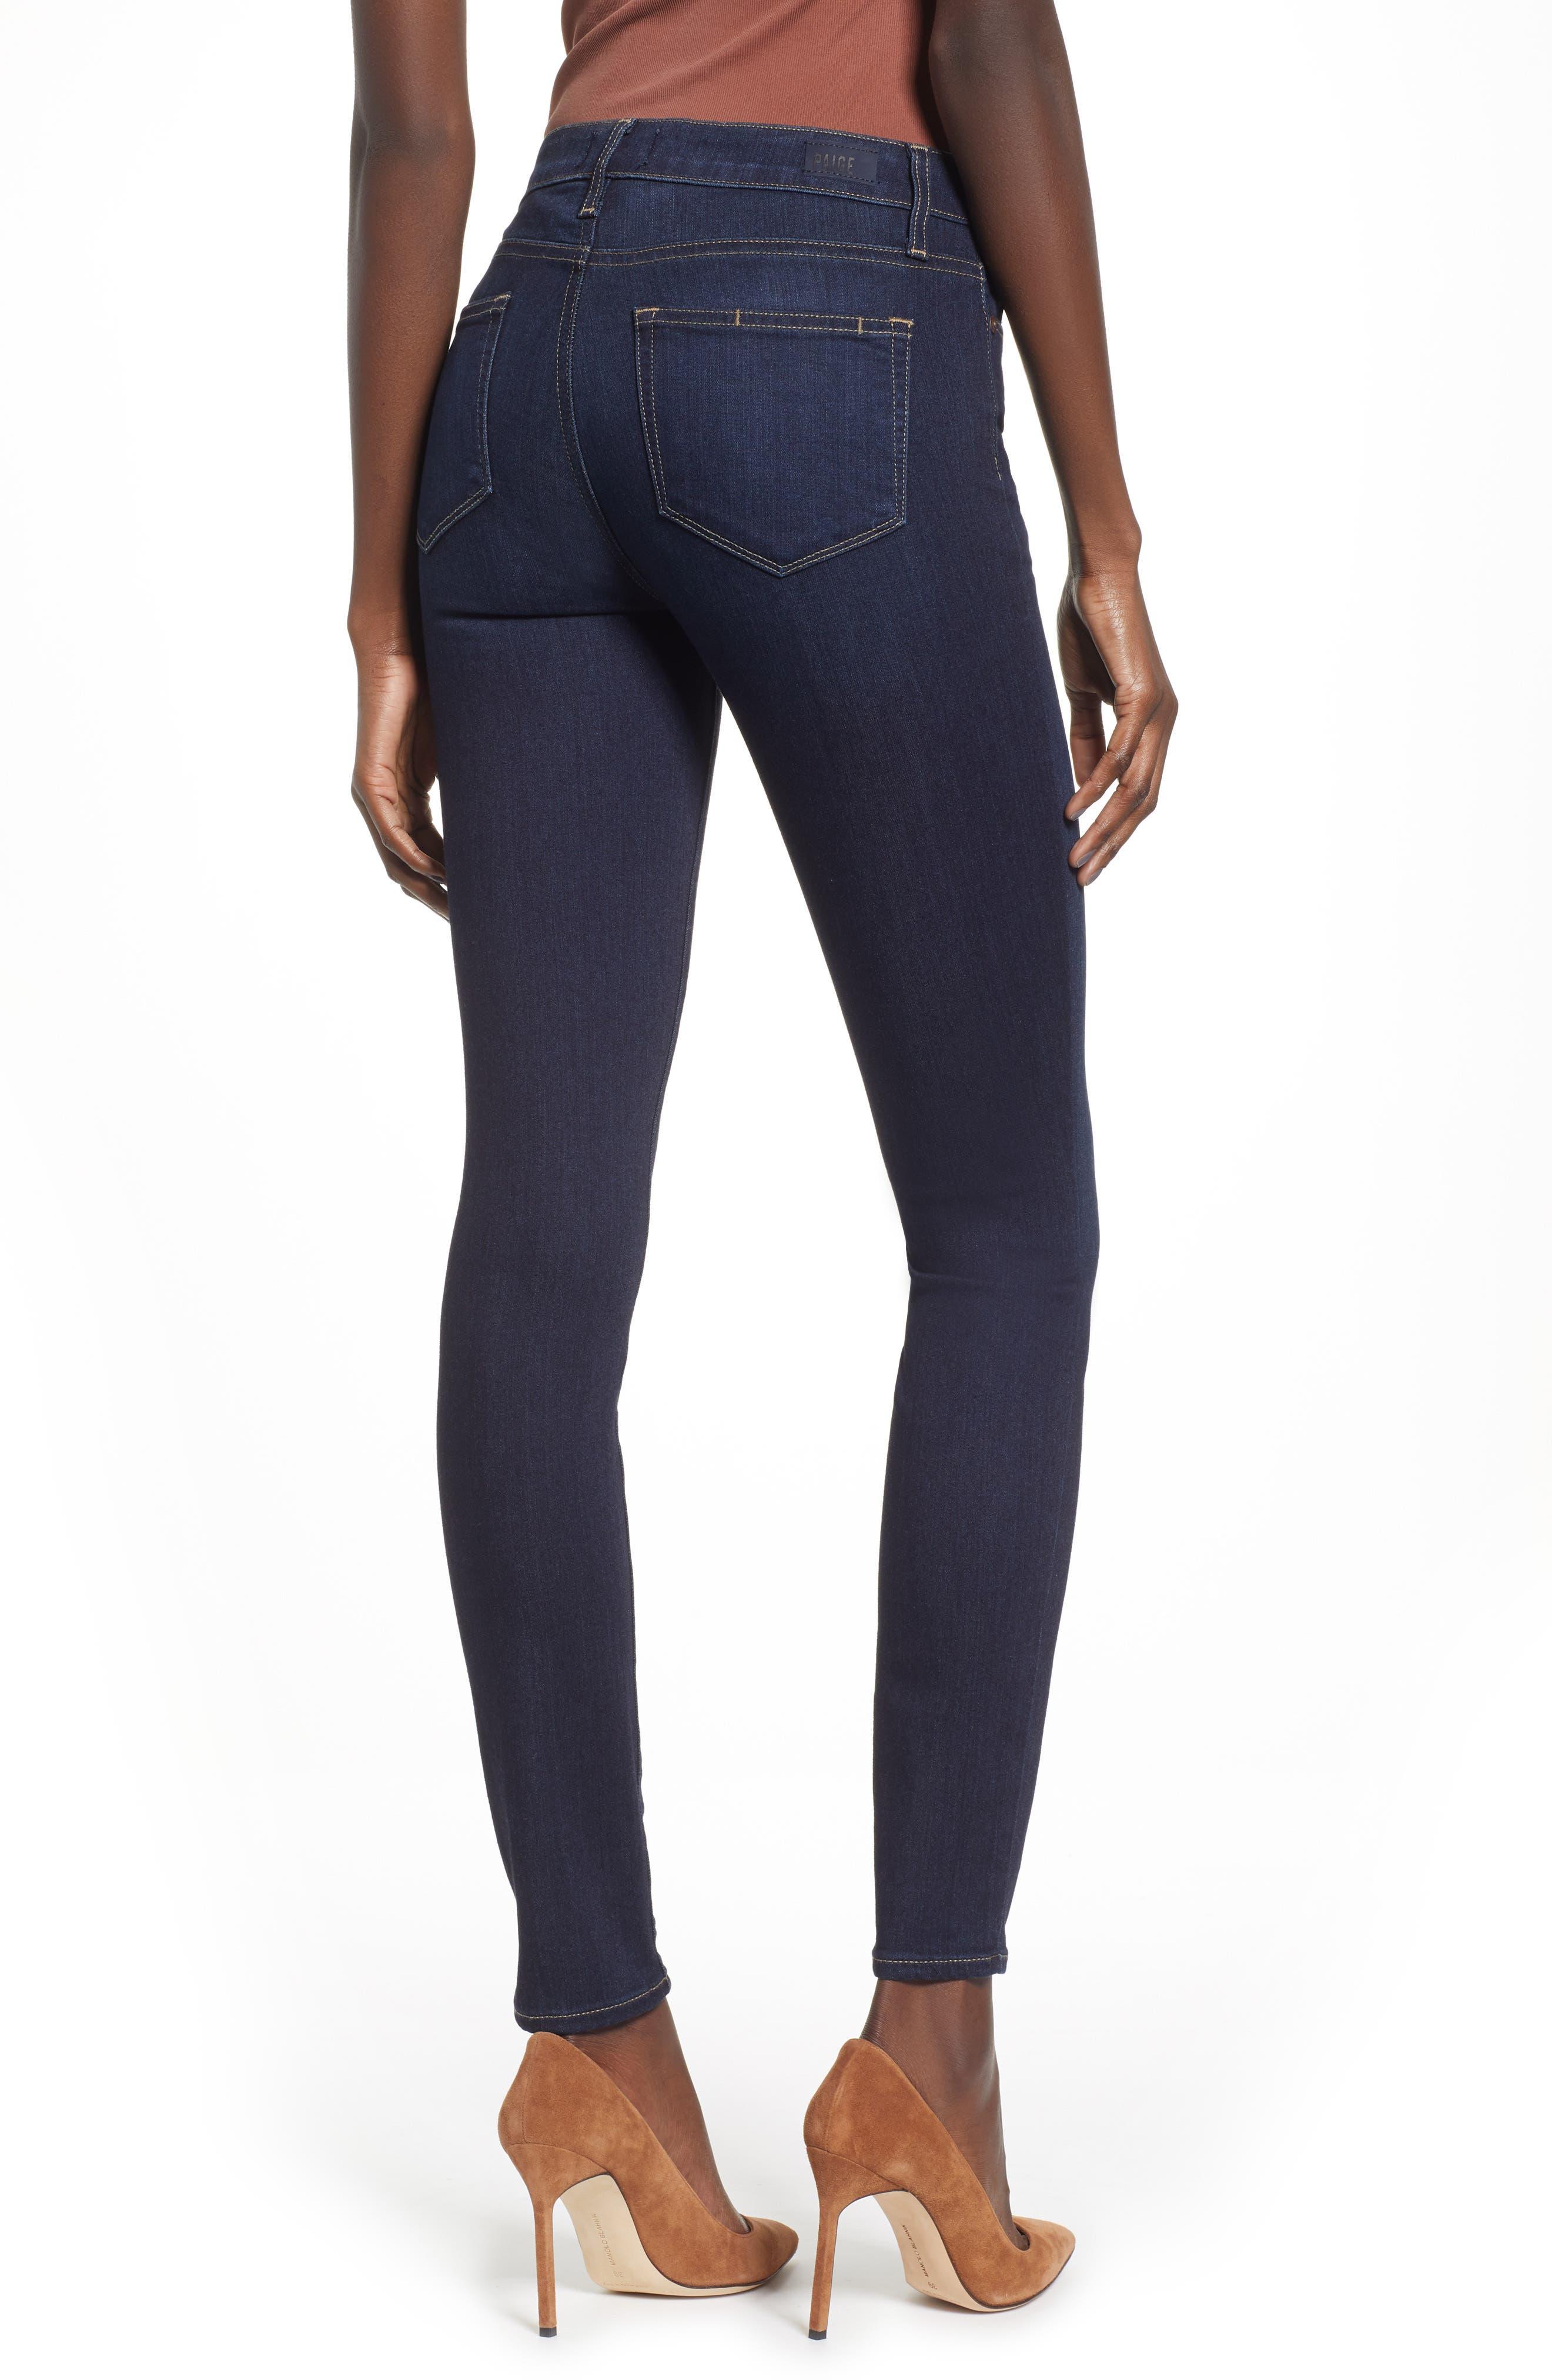 Transcend - Hoxton High Waist Ultra Skinny Jeans,                             Alternate thumbnail 2, color,                             SANIA